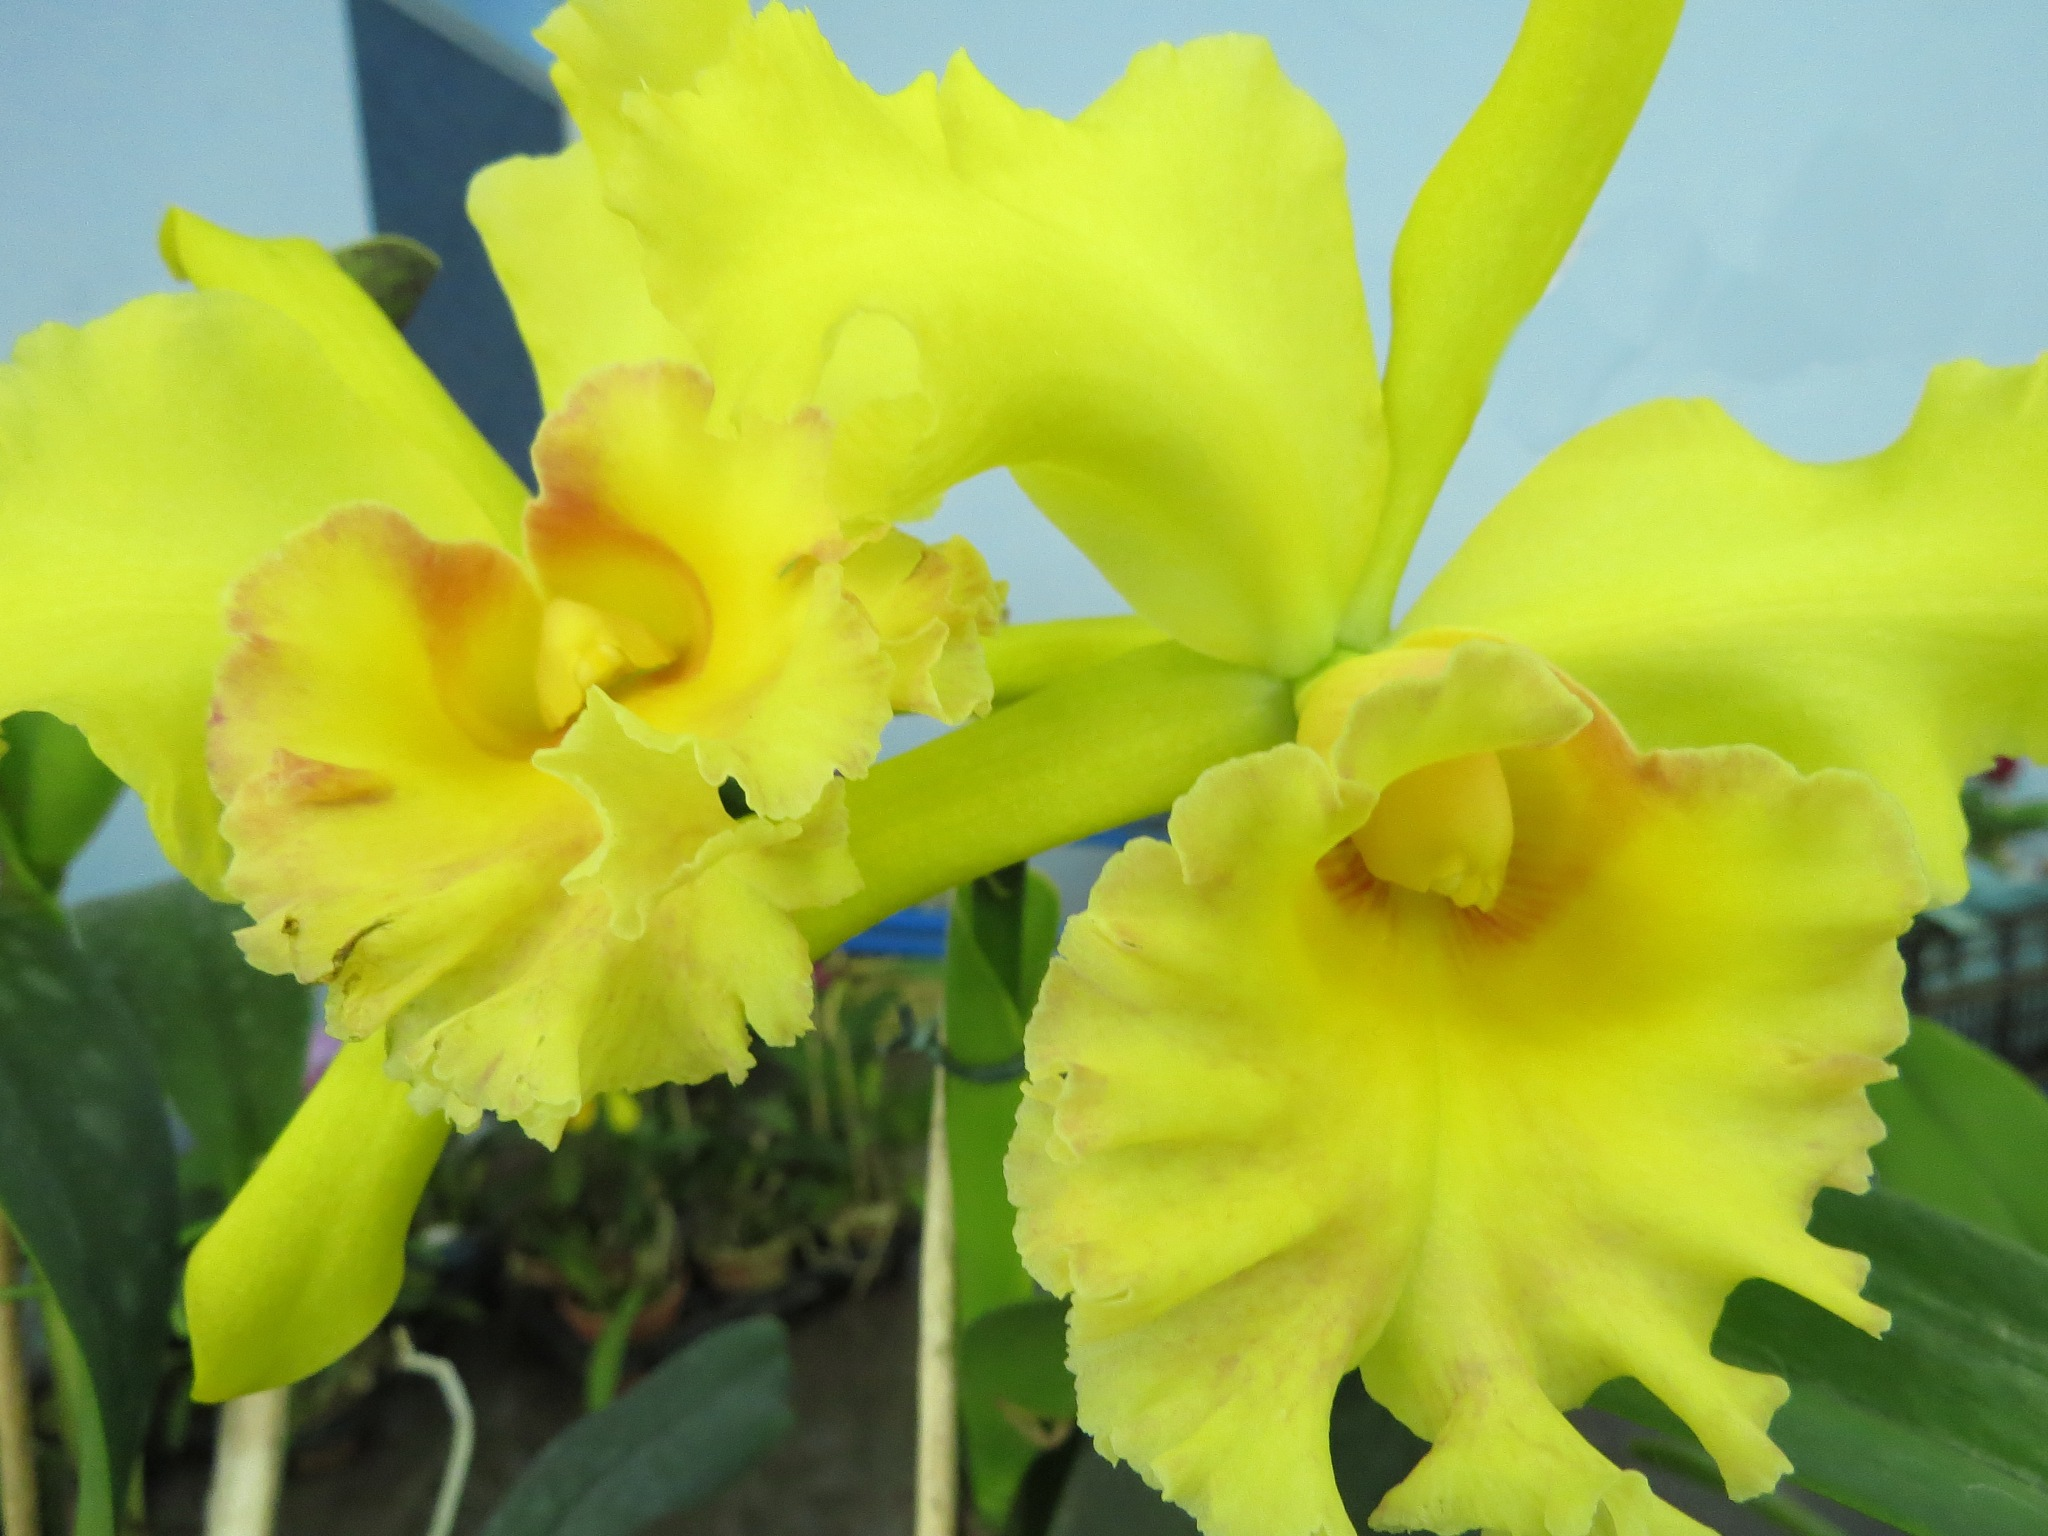 Cattleyas amarelas by Sirlei